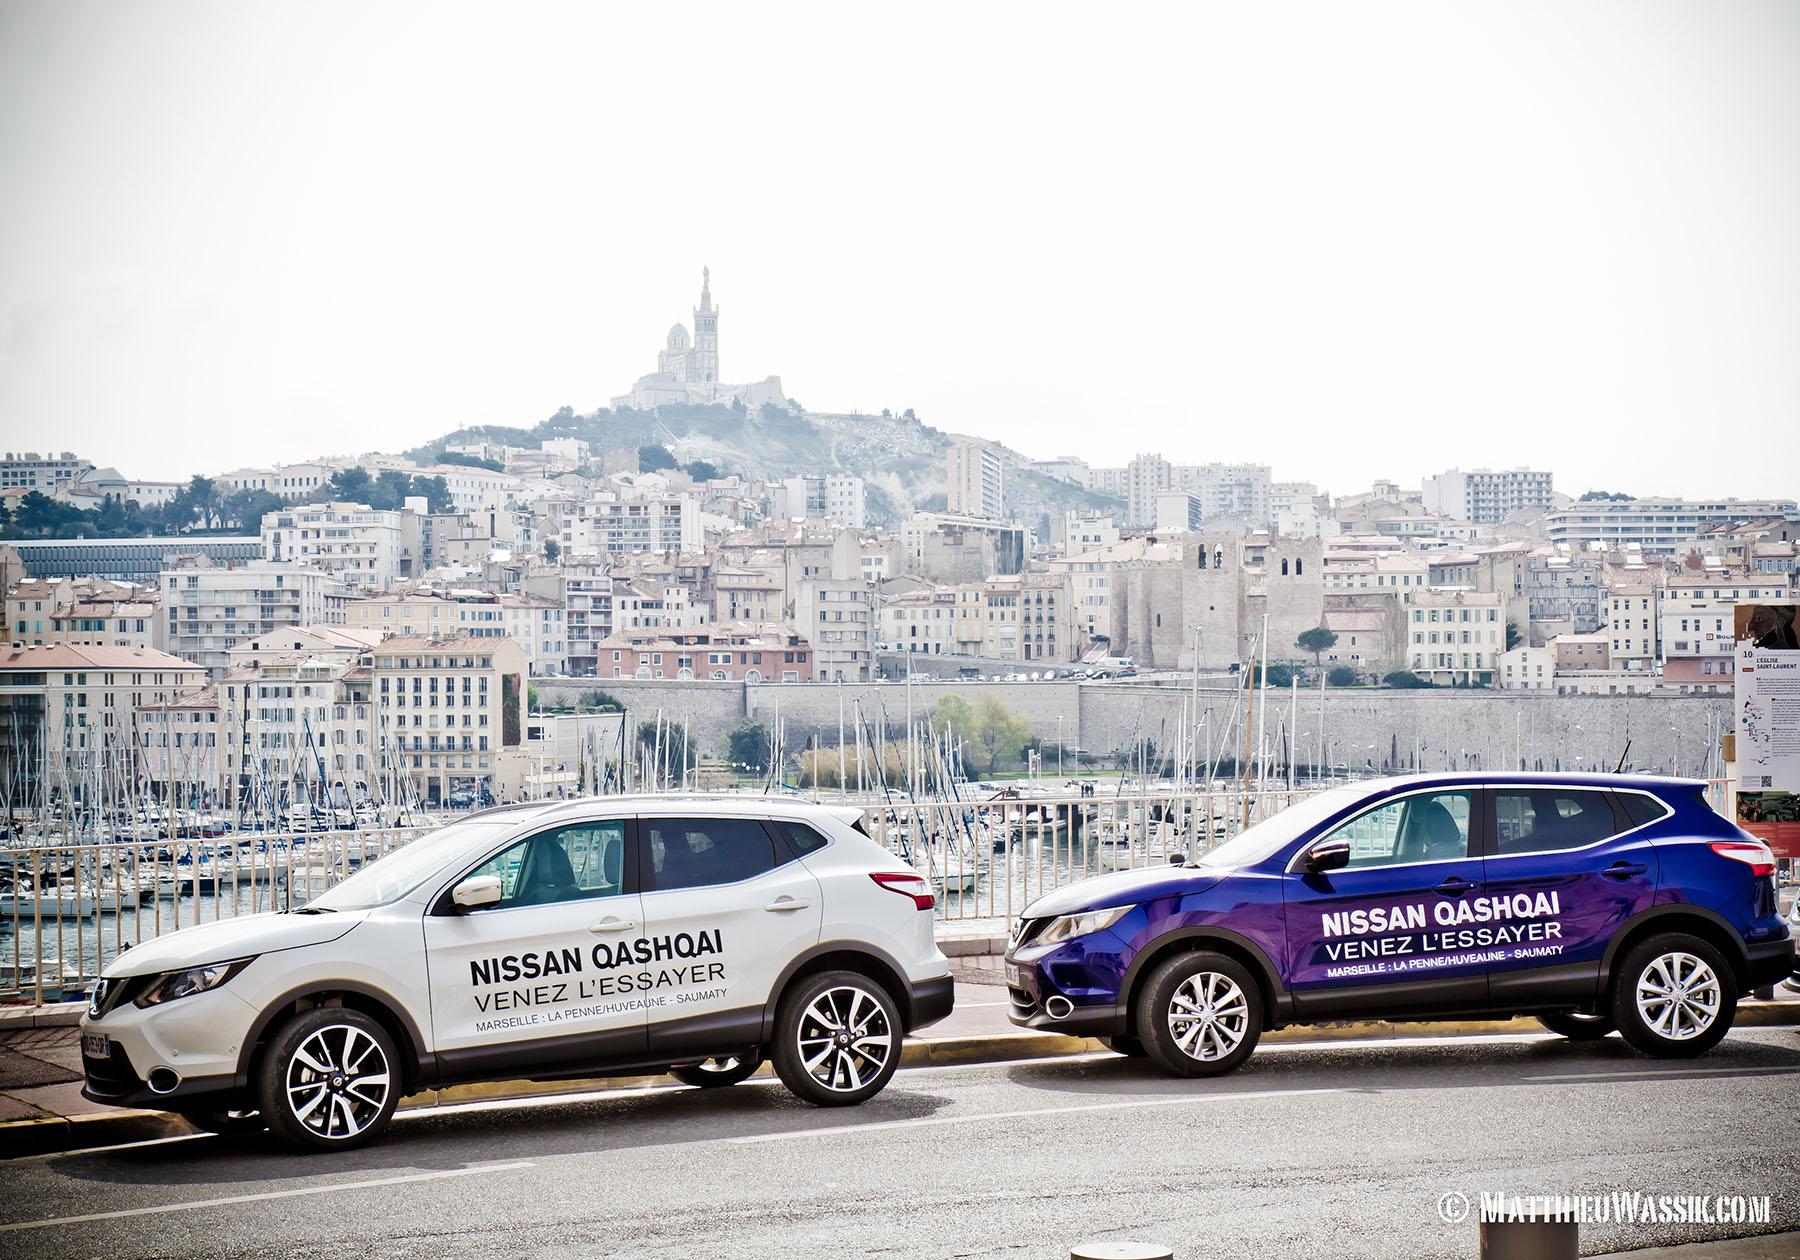 Nissan @ Marseille